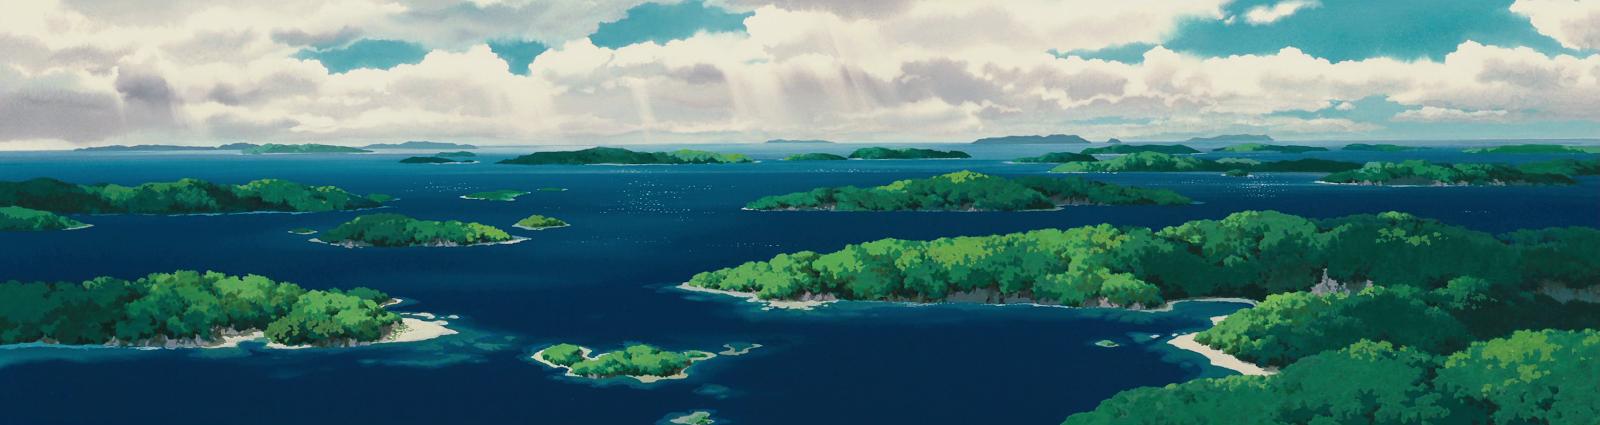 Studio Ghibli Wallpapers